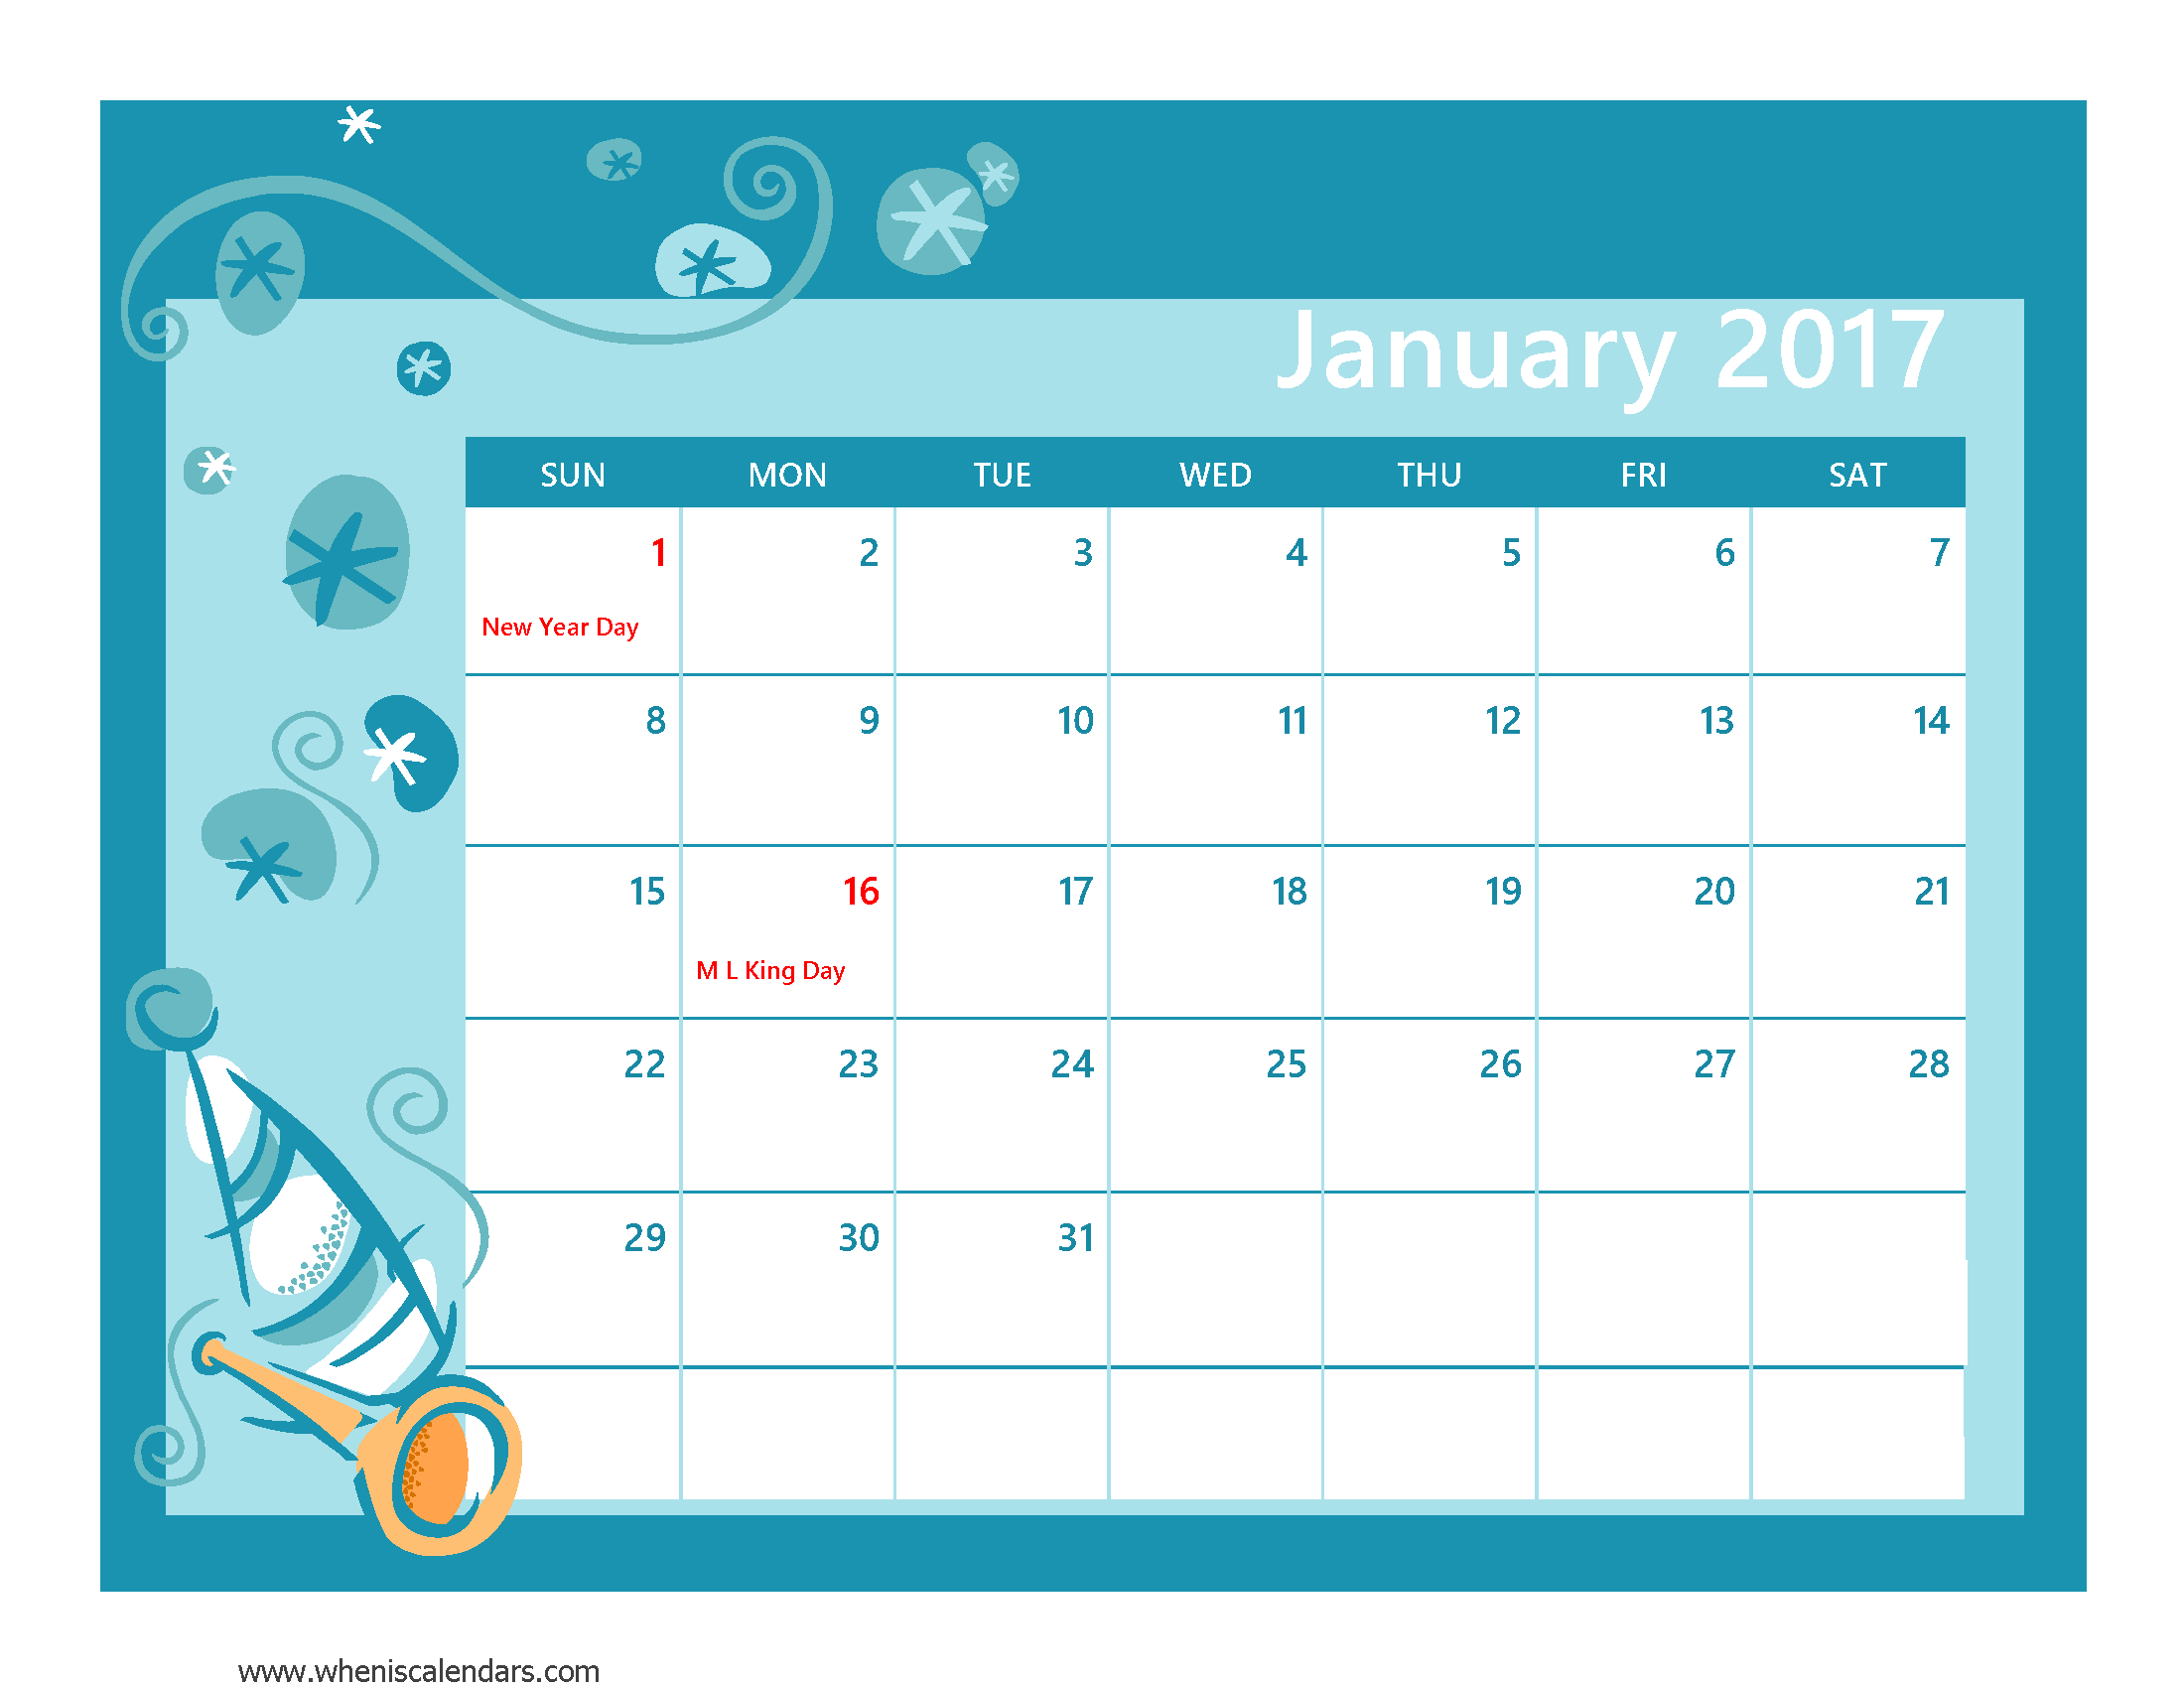 December january calendar 2017 clipart clip transparent stock Clipart january 2017 calendars - ClipartFest clip transparent stock